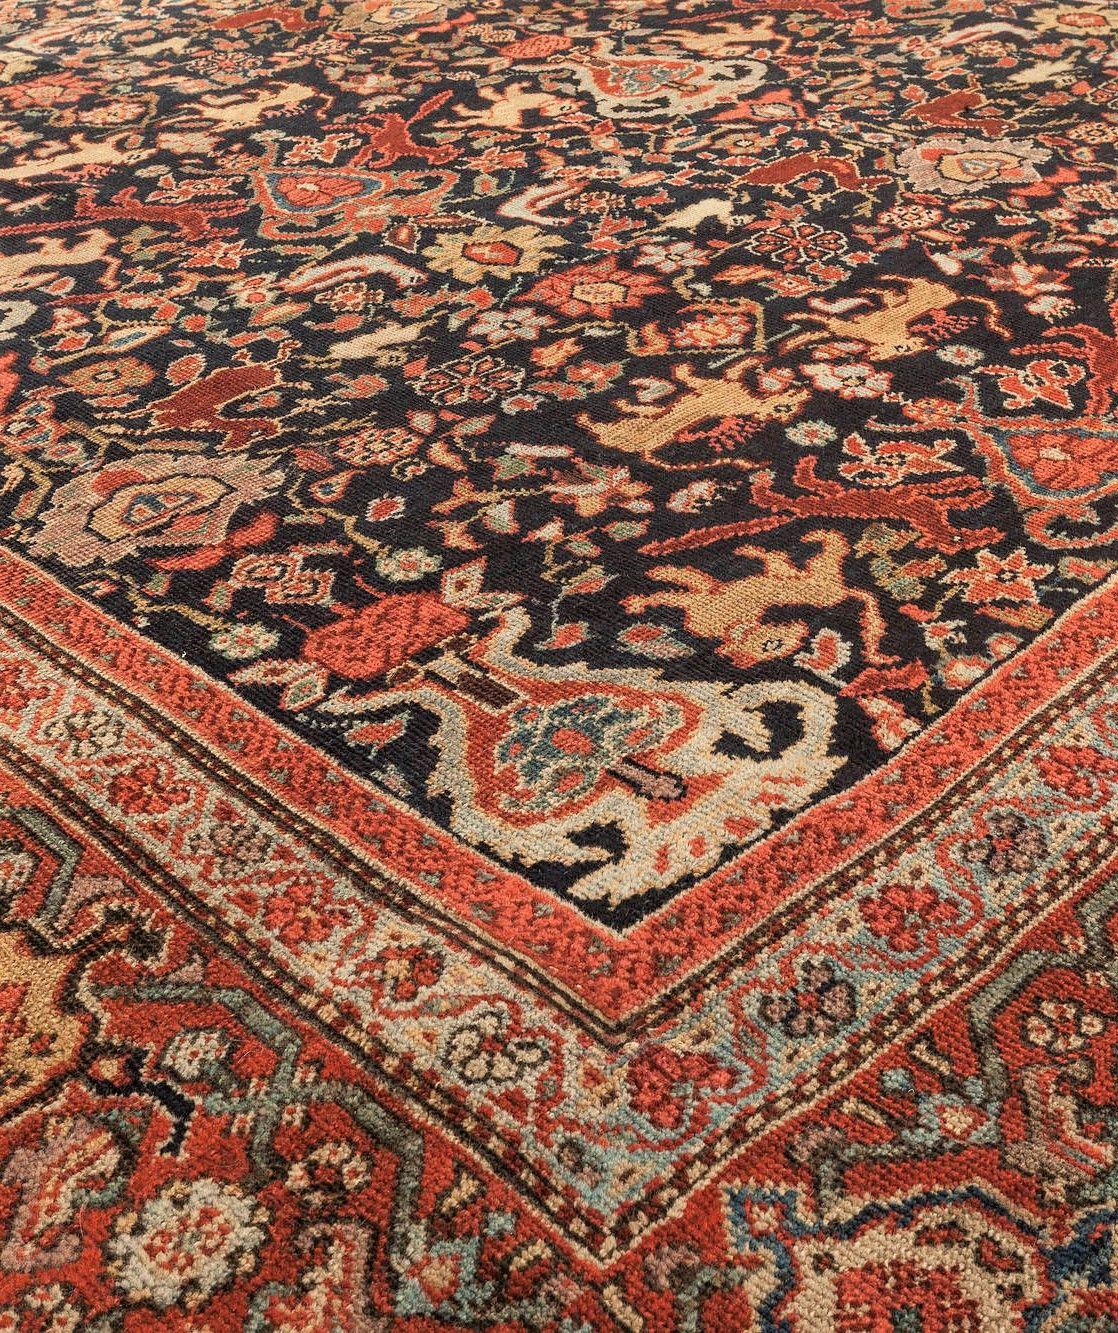 Authentic Antique And Vintage Rugs Dorisleslieblau Com Rugs Simple Carpets Silver Carpet